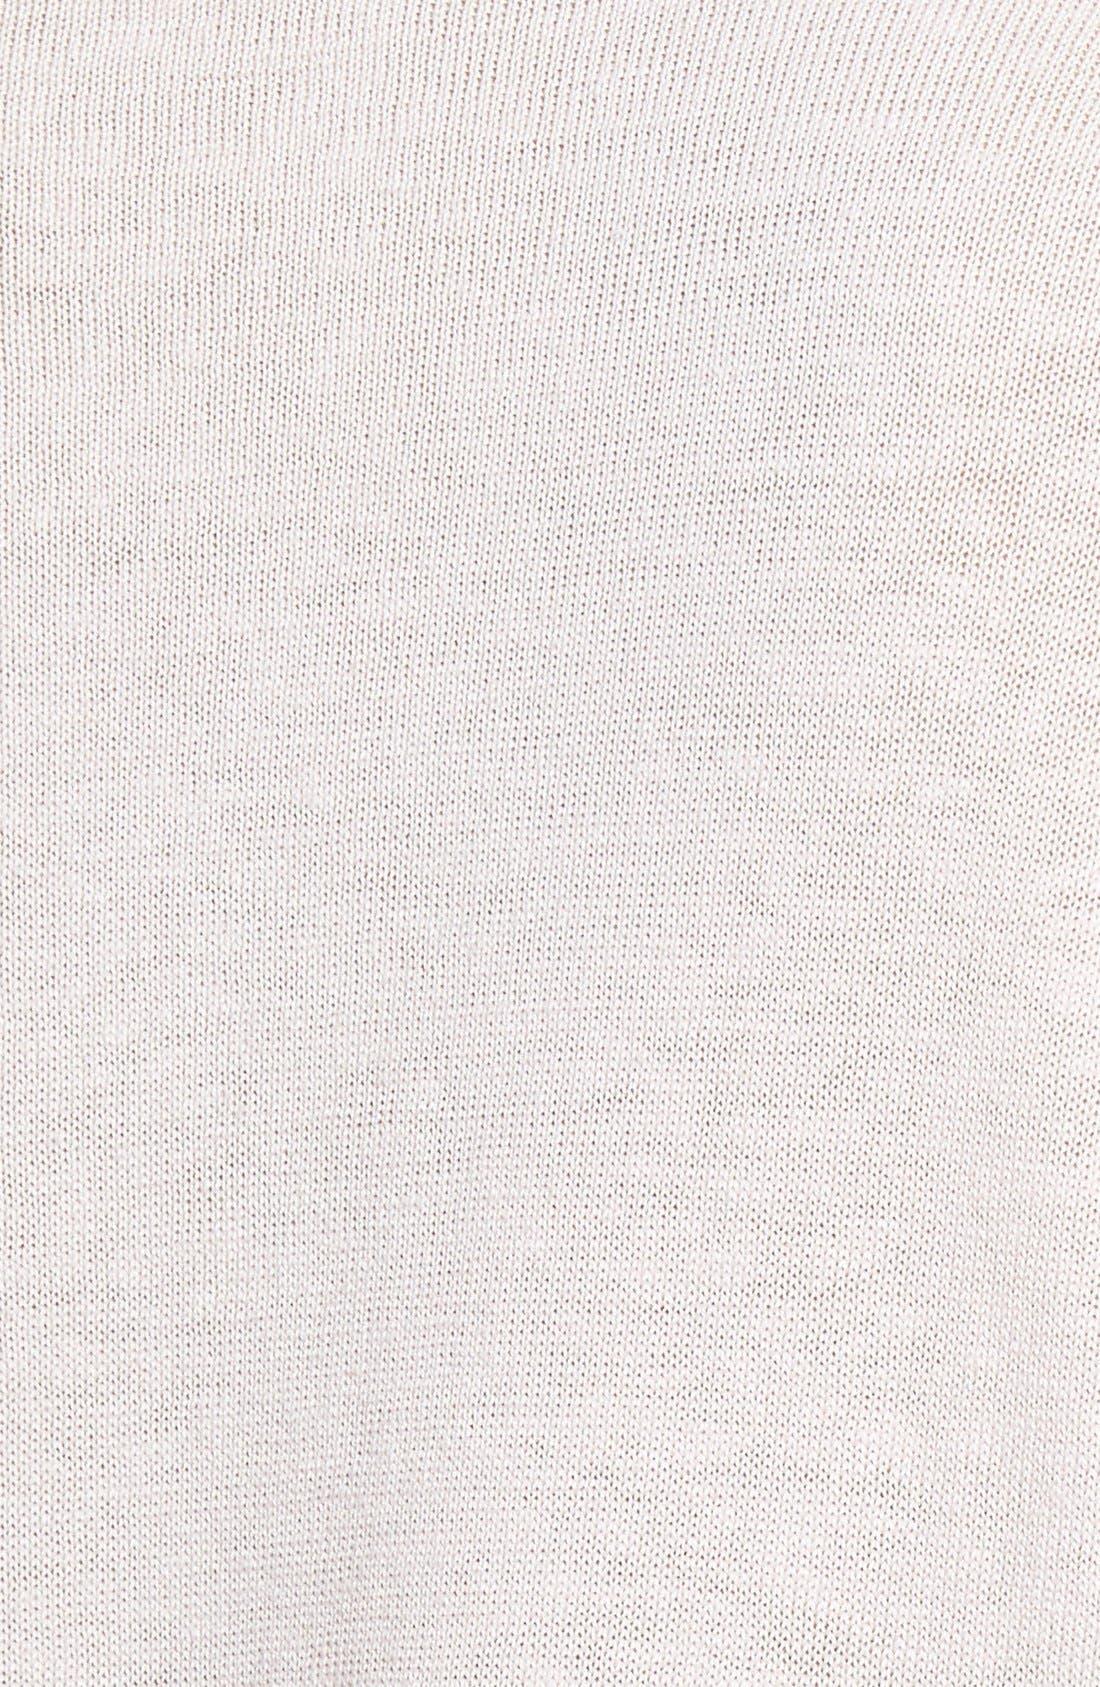 Alternate Image 3  - Nordstrom Collection 'Cerchio' V-Neck Pullover